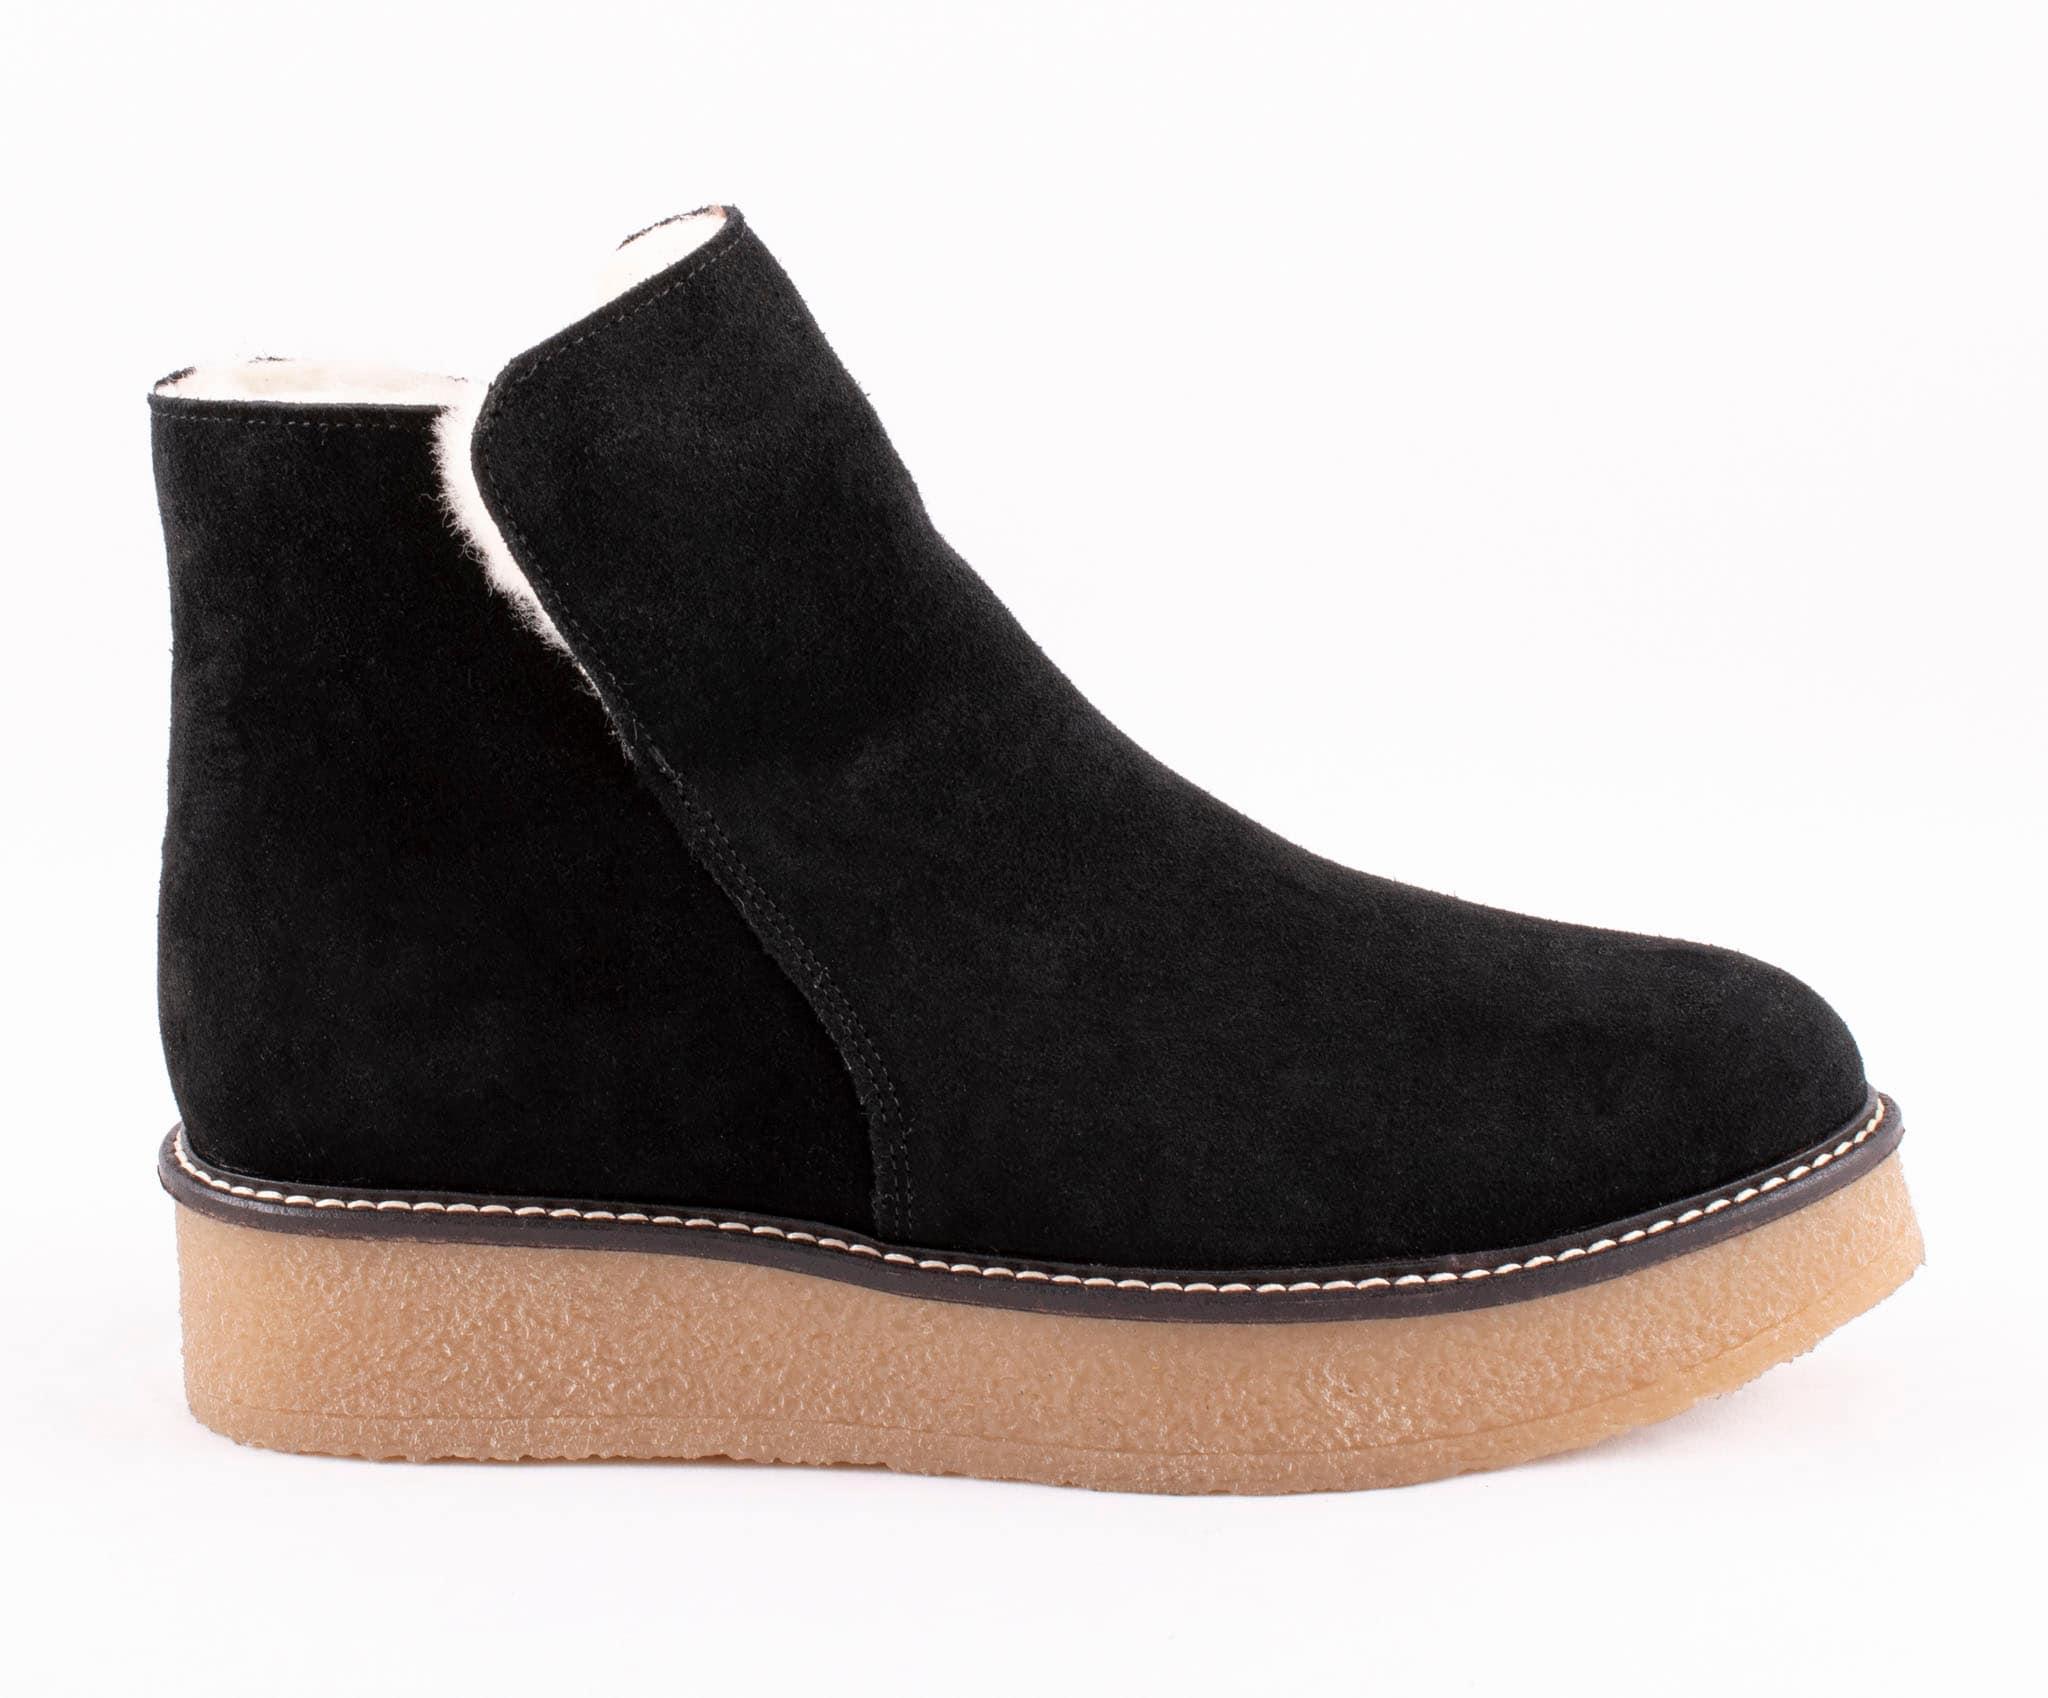 Nicki boots